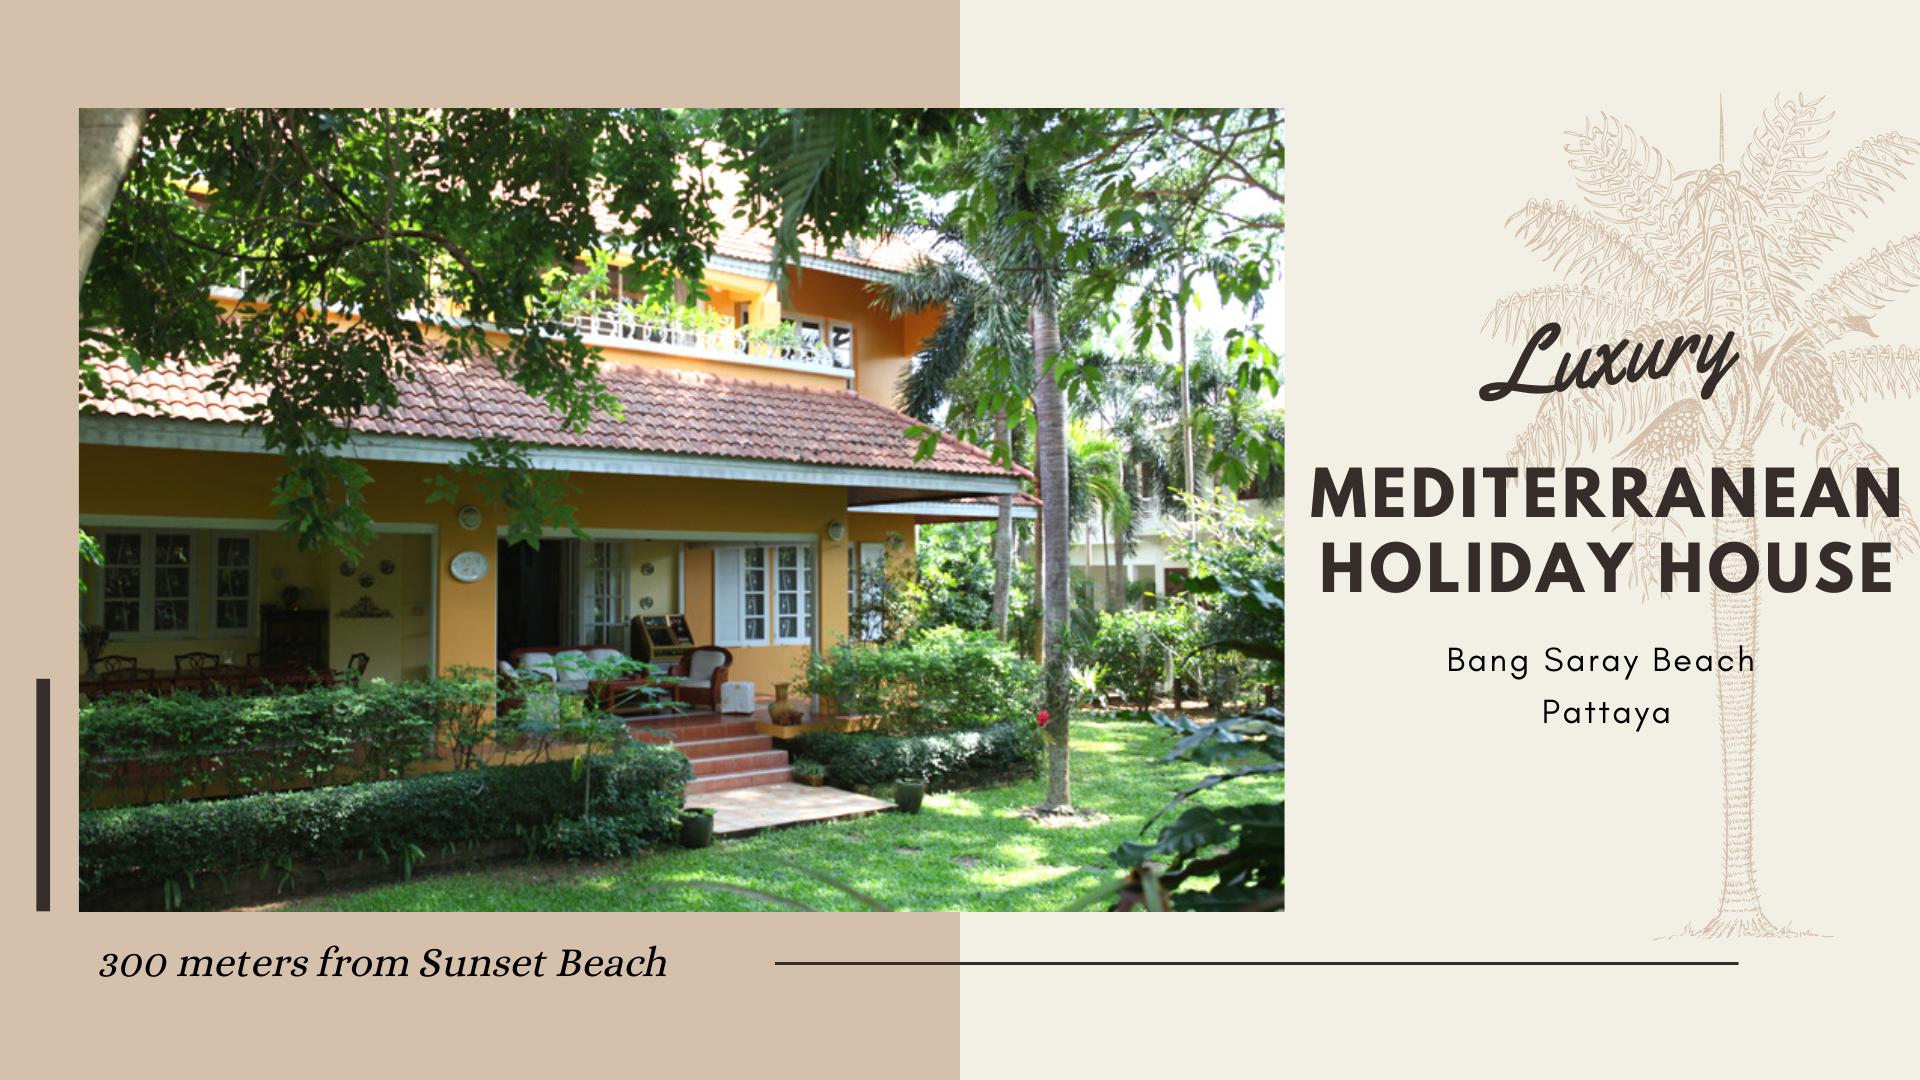 300m to beach - Luxury Mediterranean Holiday House บ้านเดี่ยว 5 ห้องนอน 4 ห้องน้ำส่วนตัว ขนาด 100 ตร.ม. – บางสเหร่